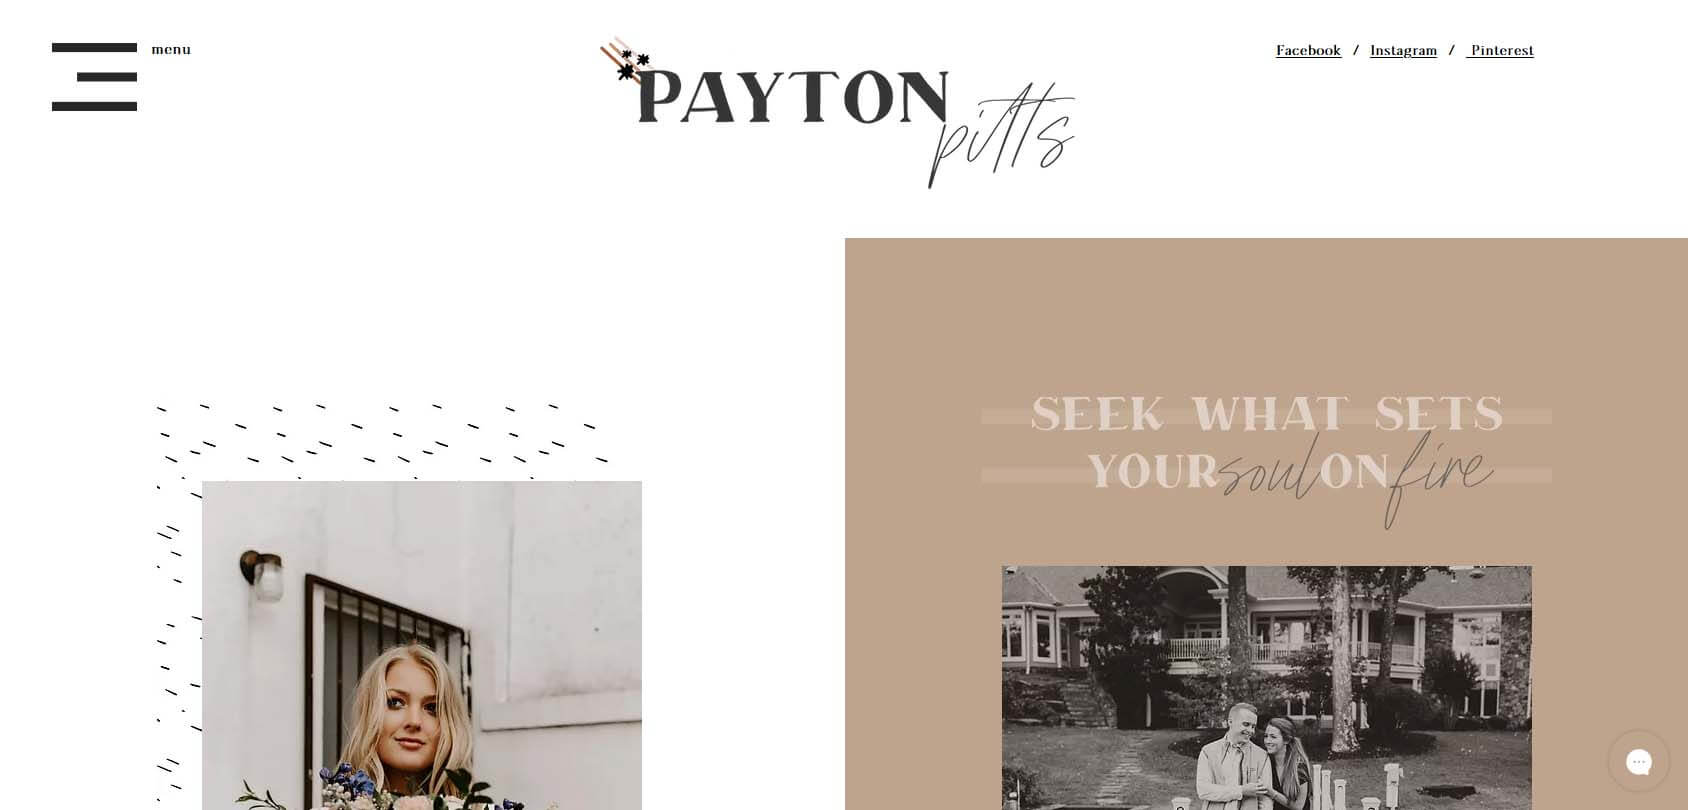 Payton Pitts Homepage